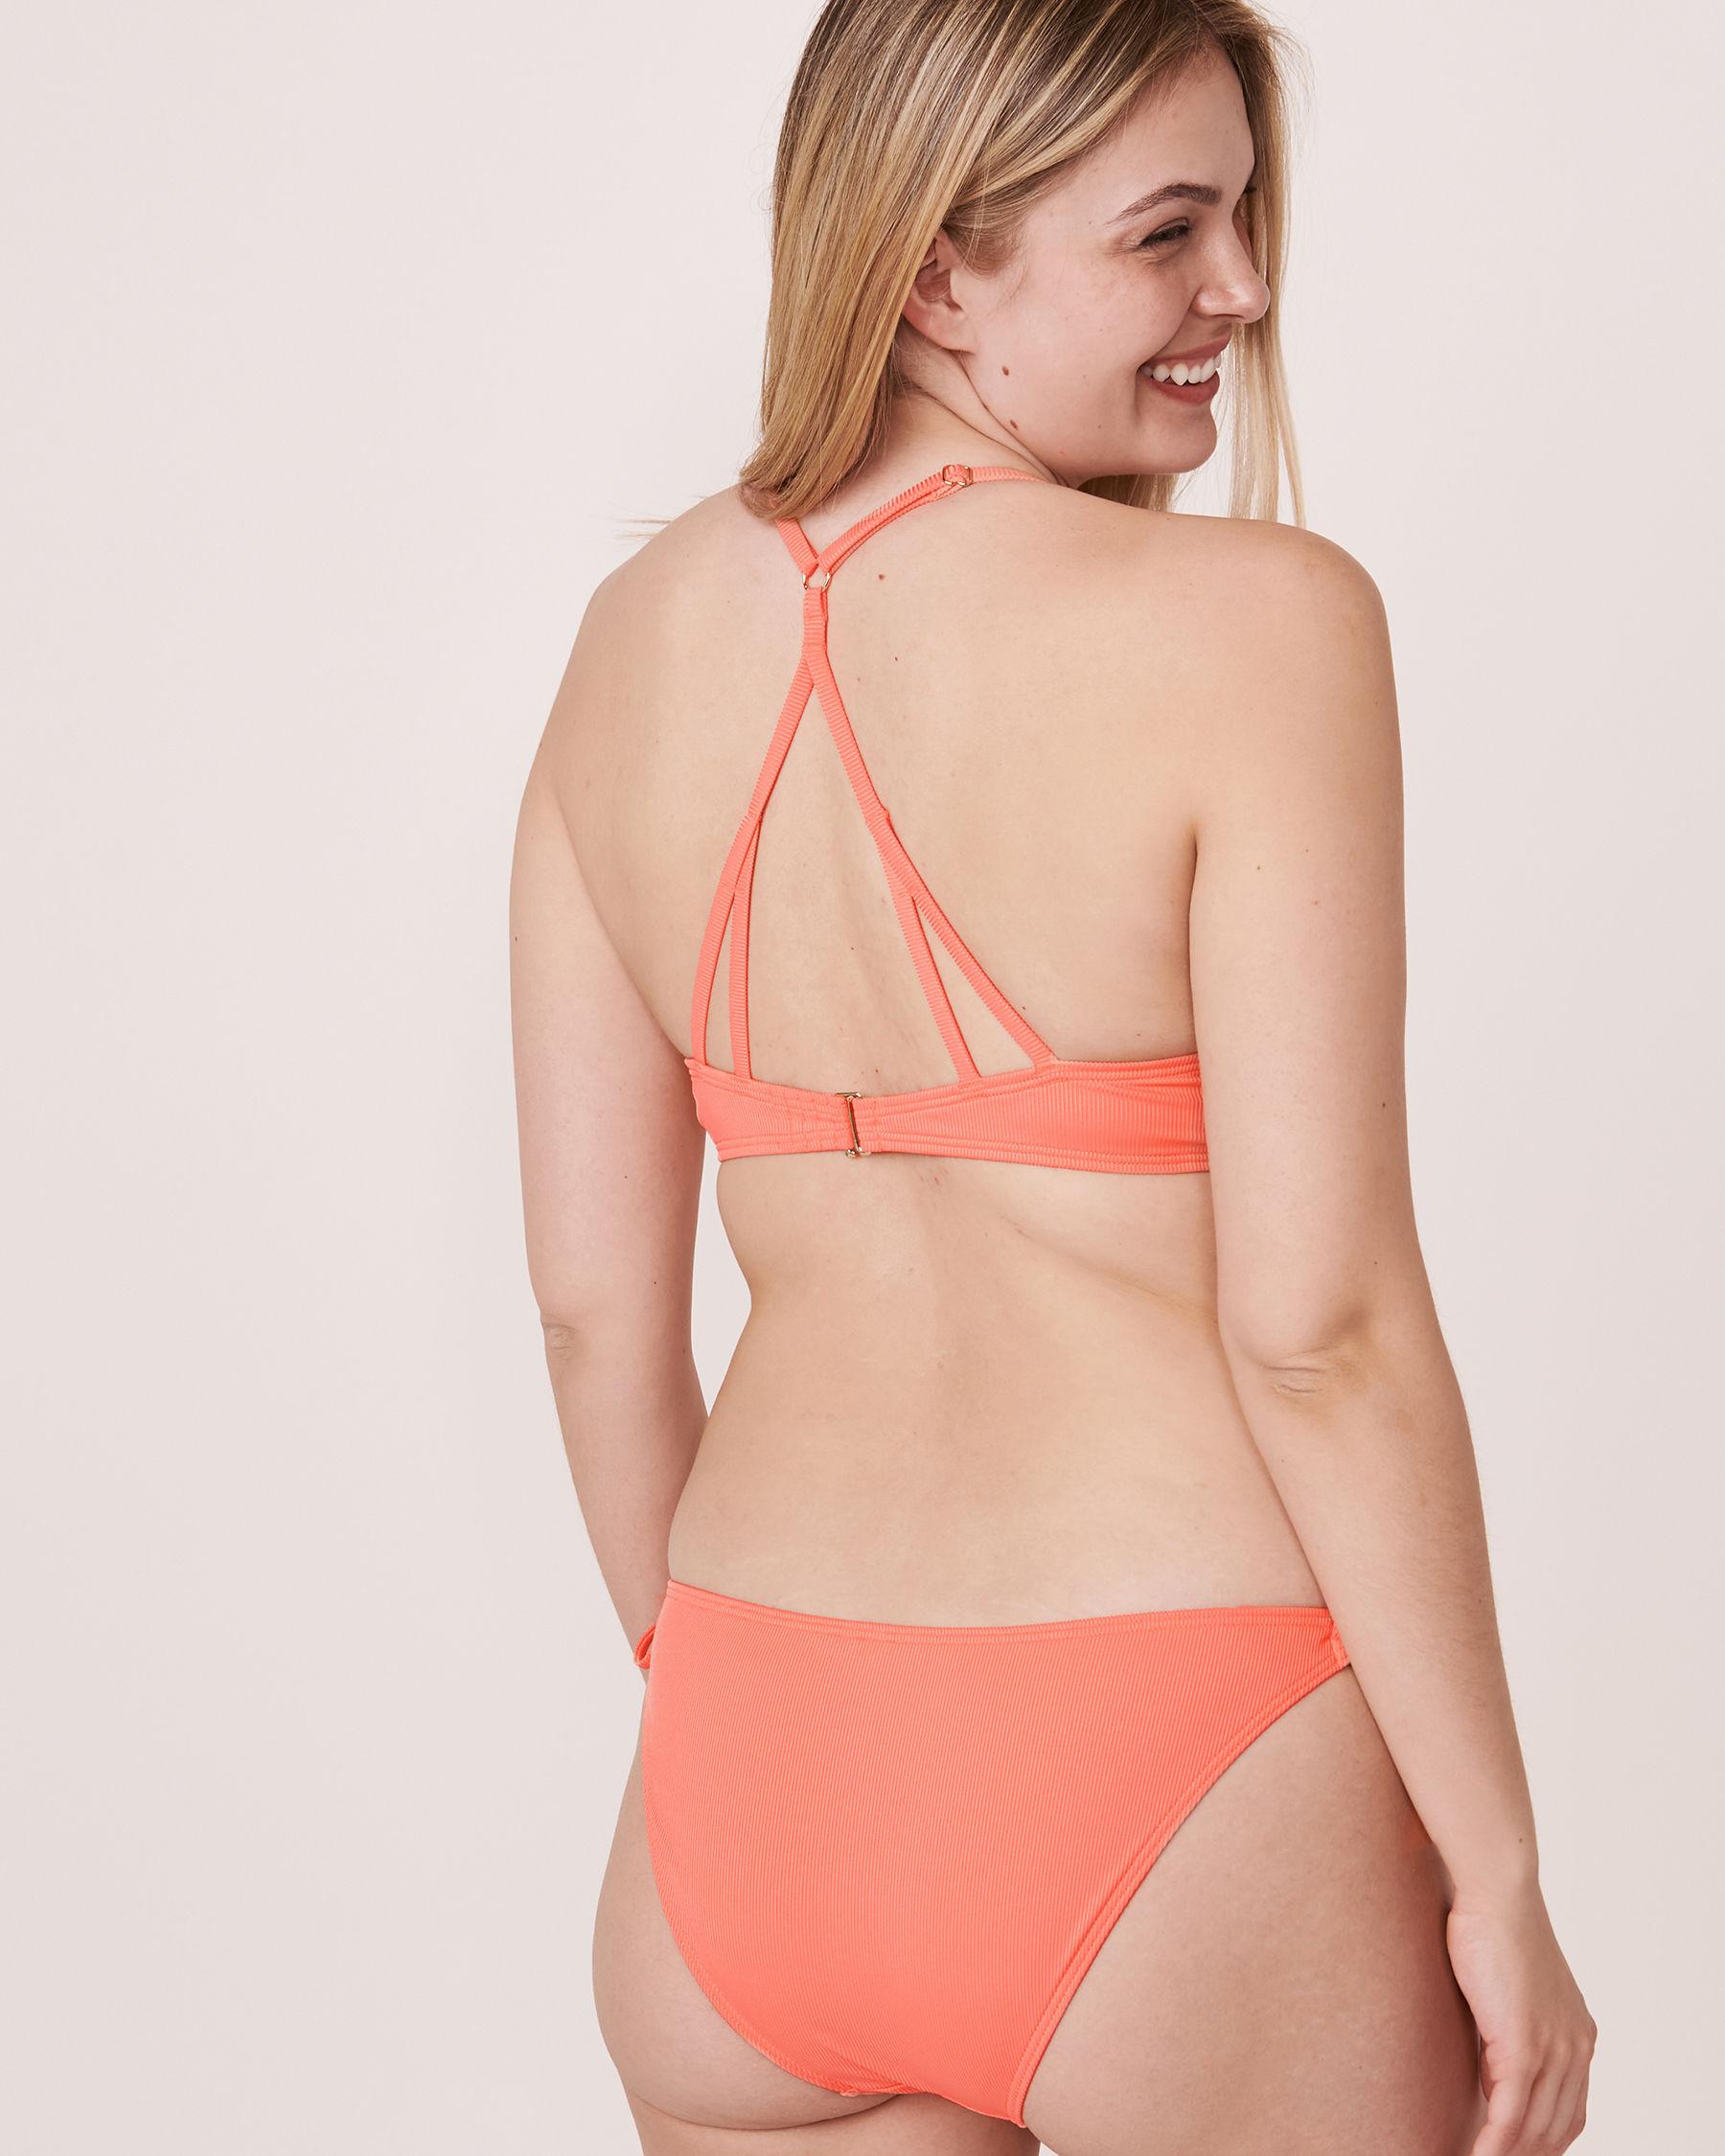 AQUAROSE Haut de bikini push-up en fibres recyclées SOLID RIB Corail 70100061 - Voir3